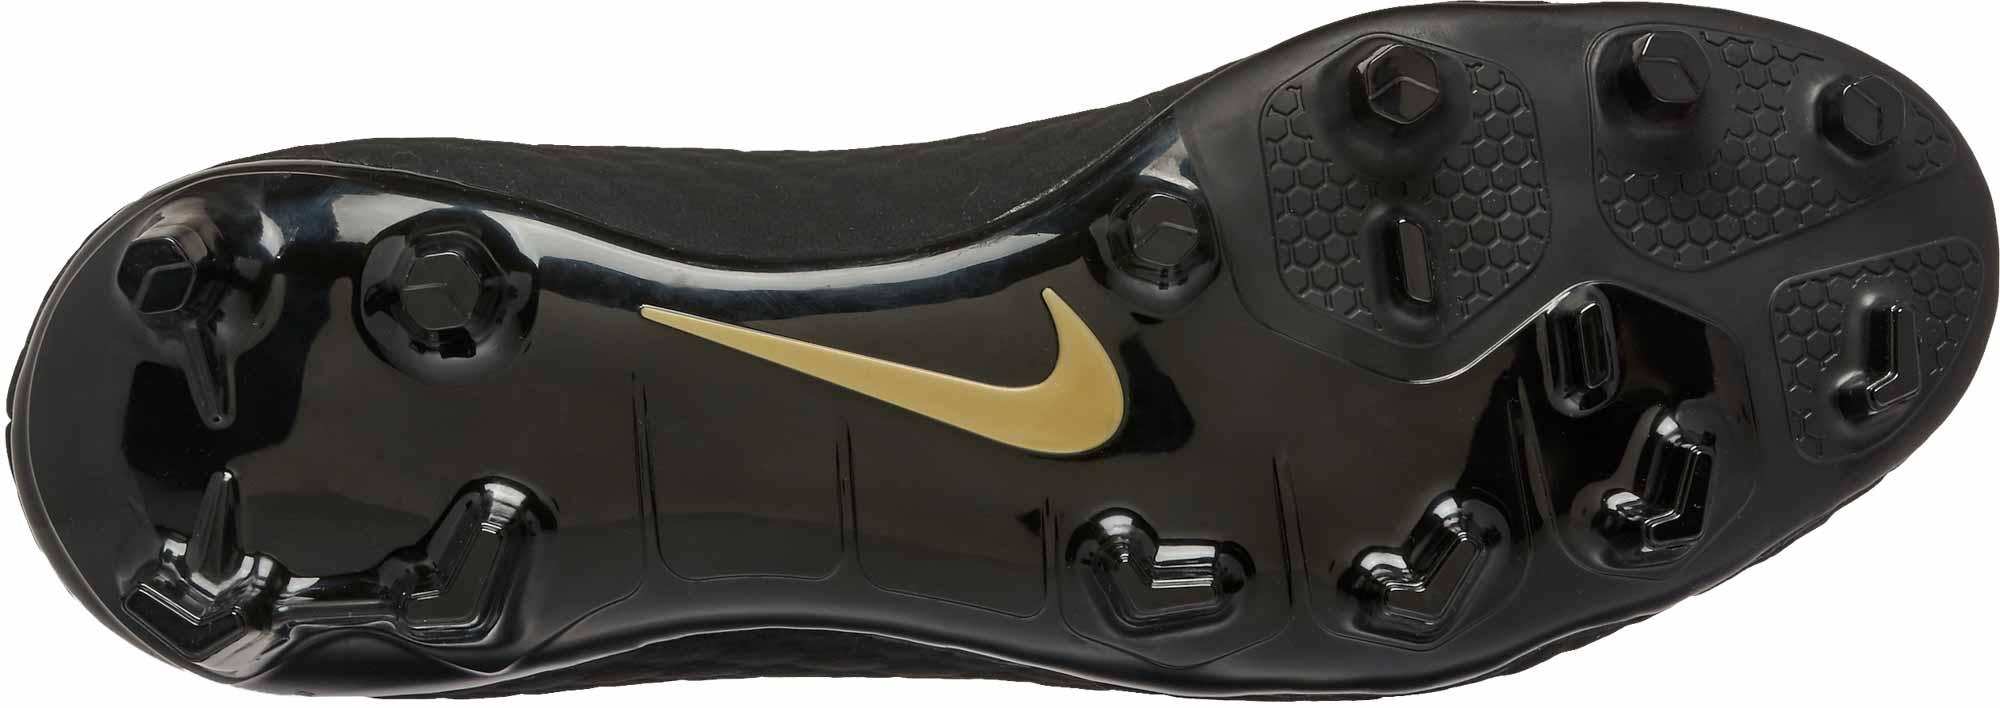 ba31582725a Nike Hypervenom Phantom III Academy DF FG – Black Metallic Vivid Gold